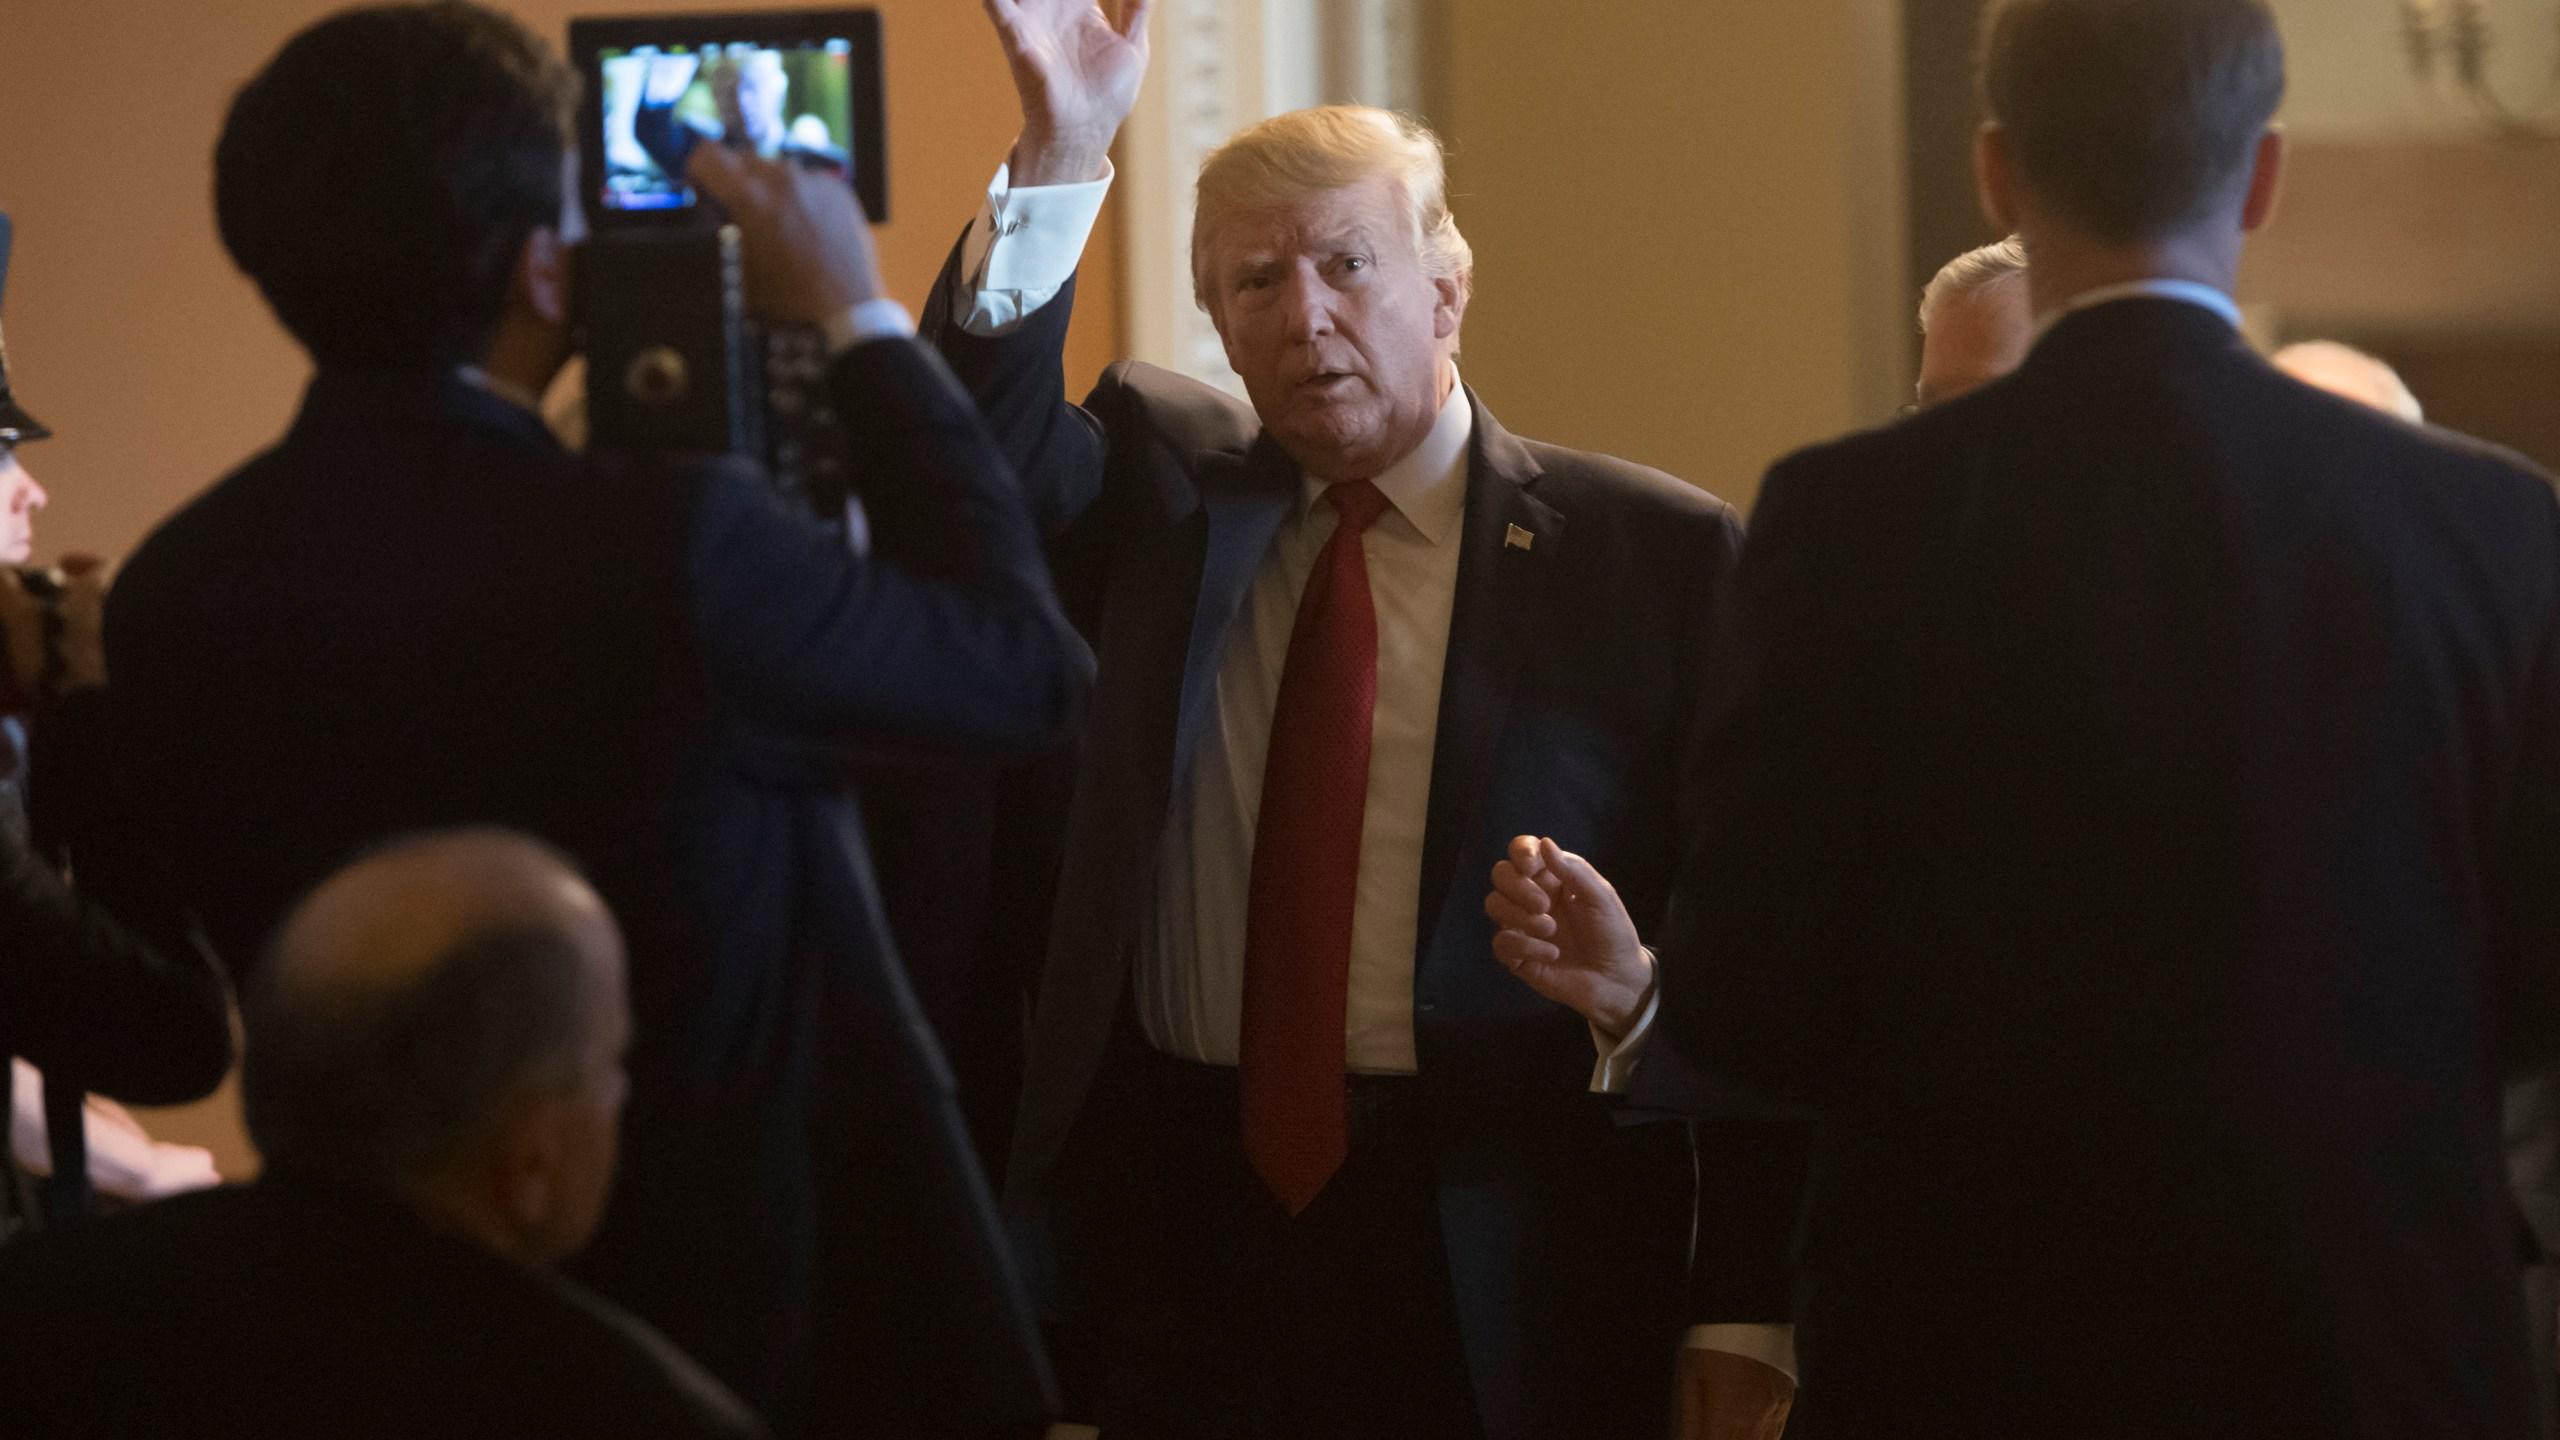 Donald Trump arrives to meet with Republican Senators at the U.S. Capitol on October 24, 2017. (Credit: Saul Loeb/AFP/Getty Images)